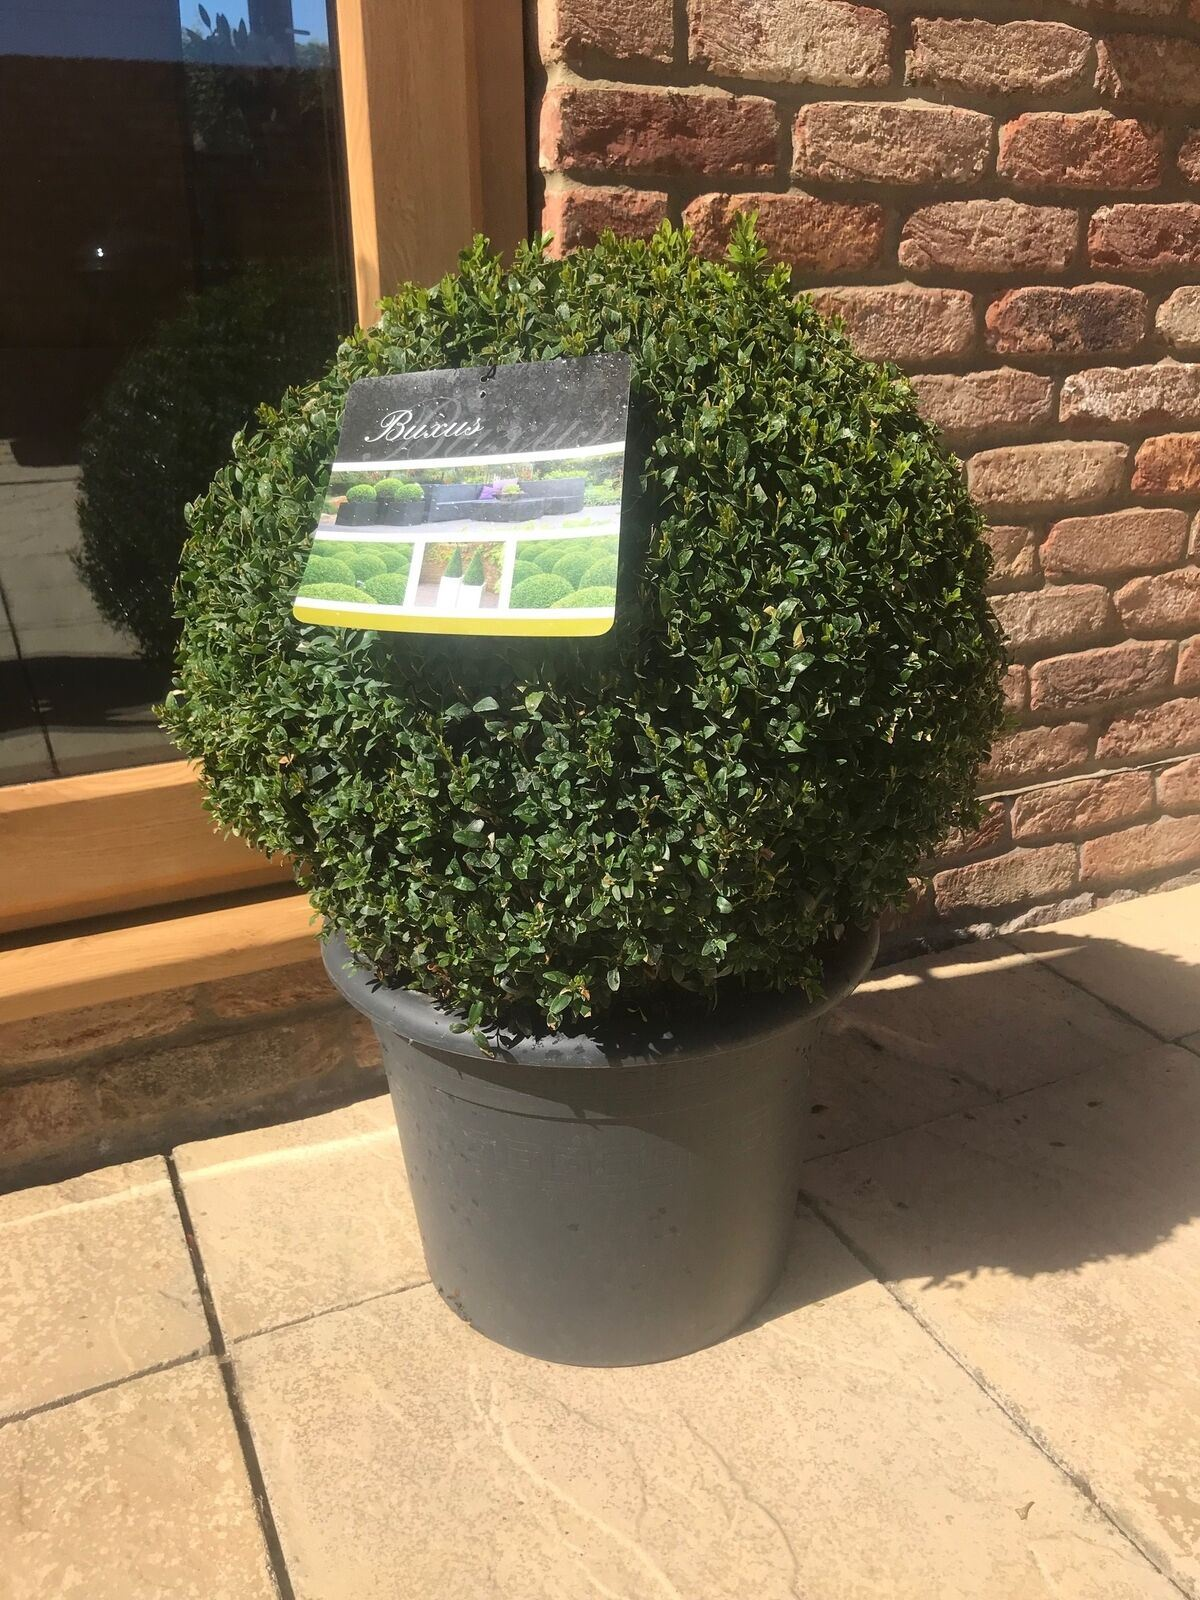 2X LARGE BUXUS BOX BALL PLANTS ROUND TOPIARY BALLS 30-35cm